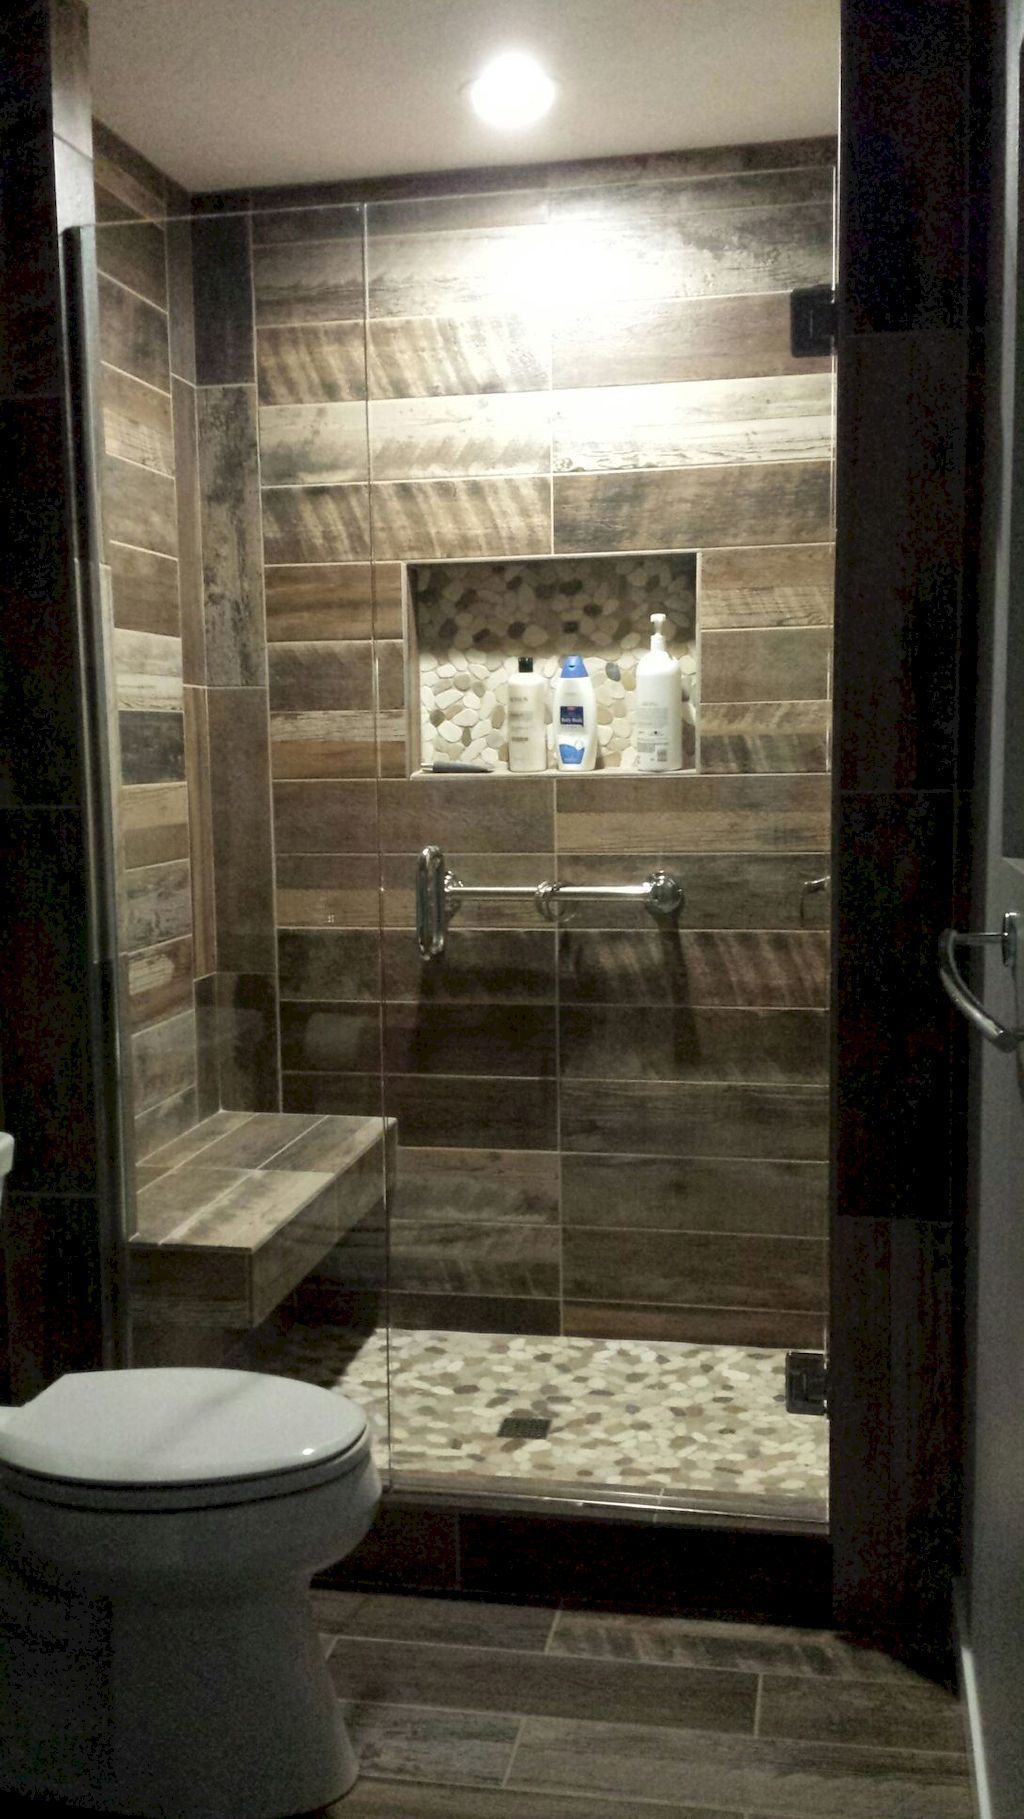 Clever Tiny House Bathroom Shower Ideas 16 Masterbedrooms Bathroom Remodel Shower Tiny House Bathroom Budget Bathroom Remodel